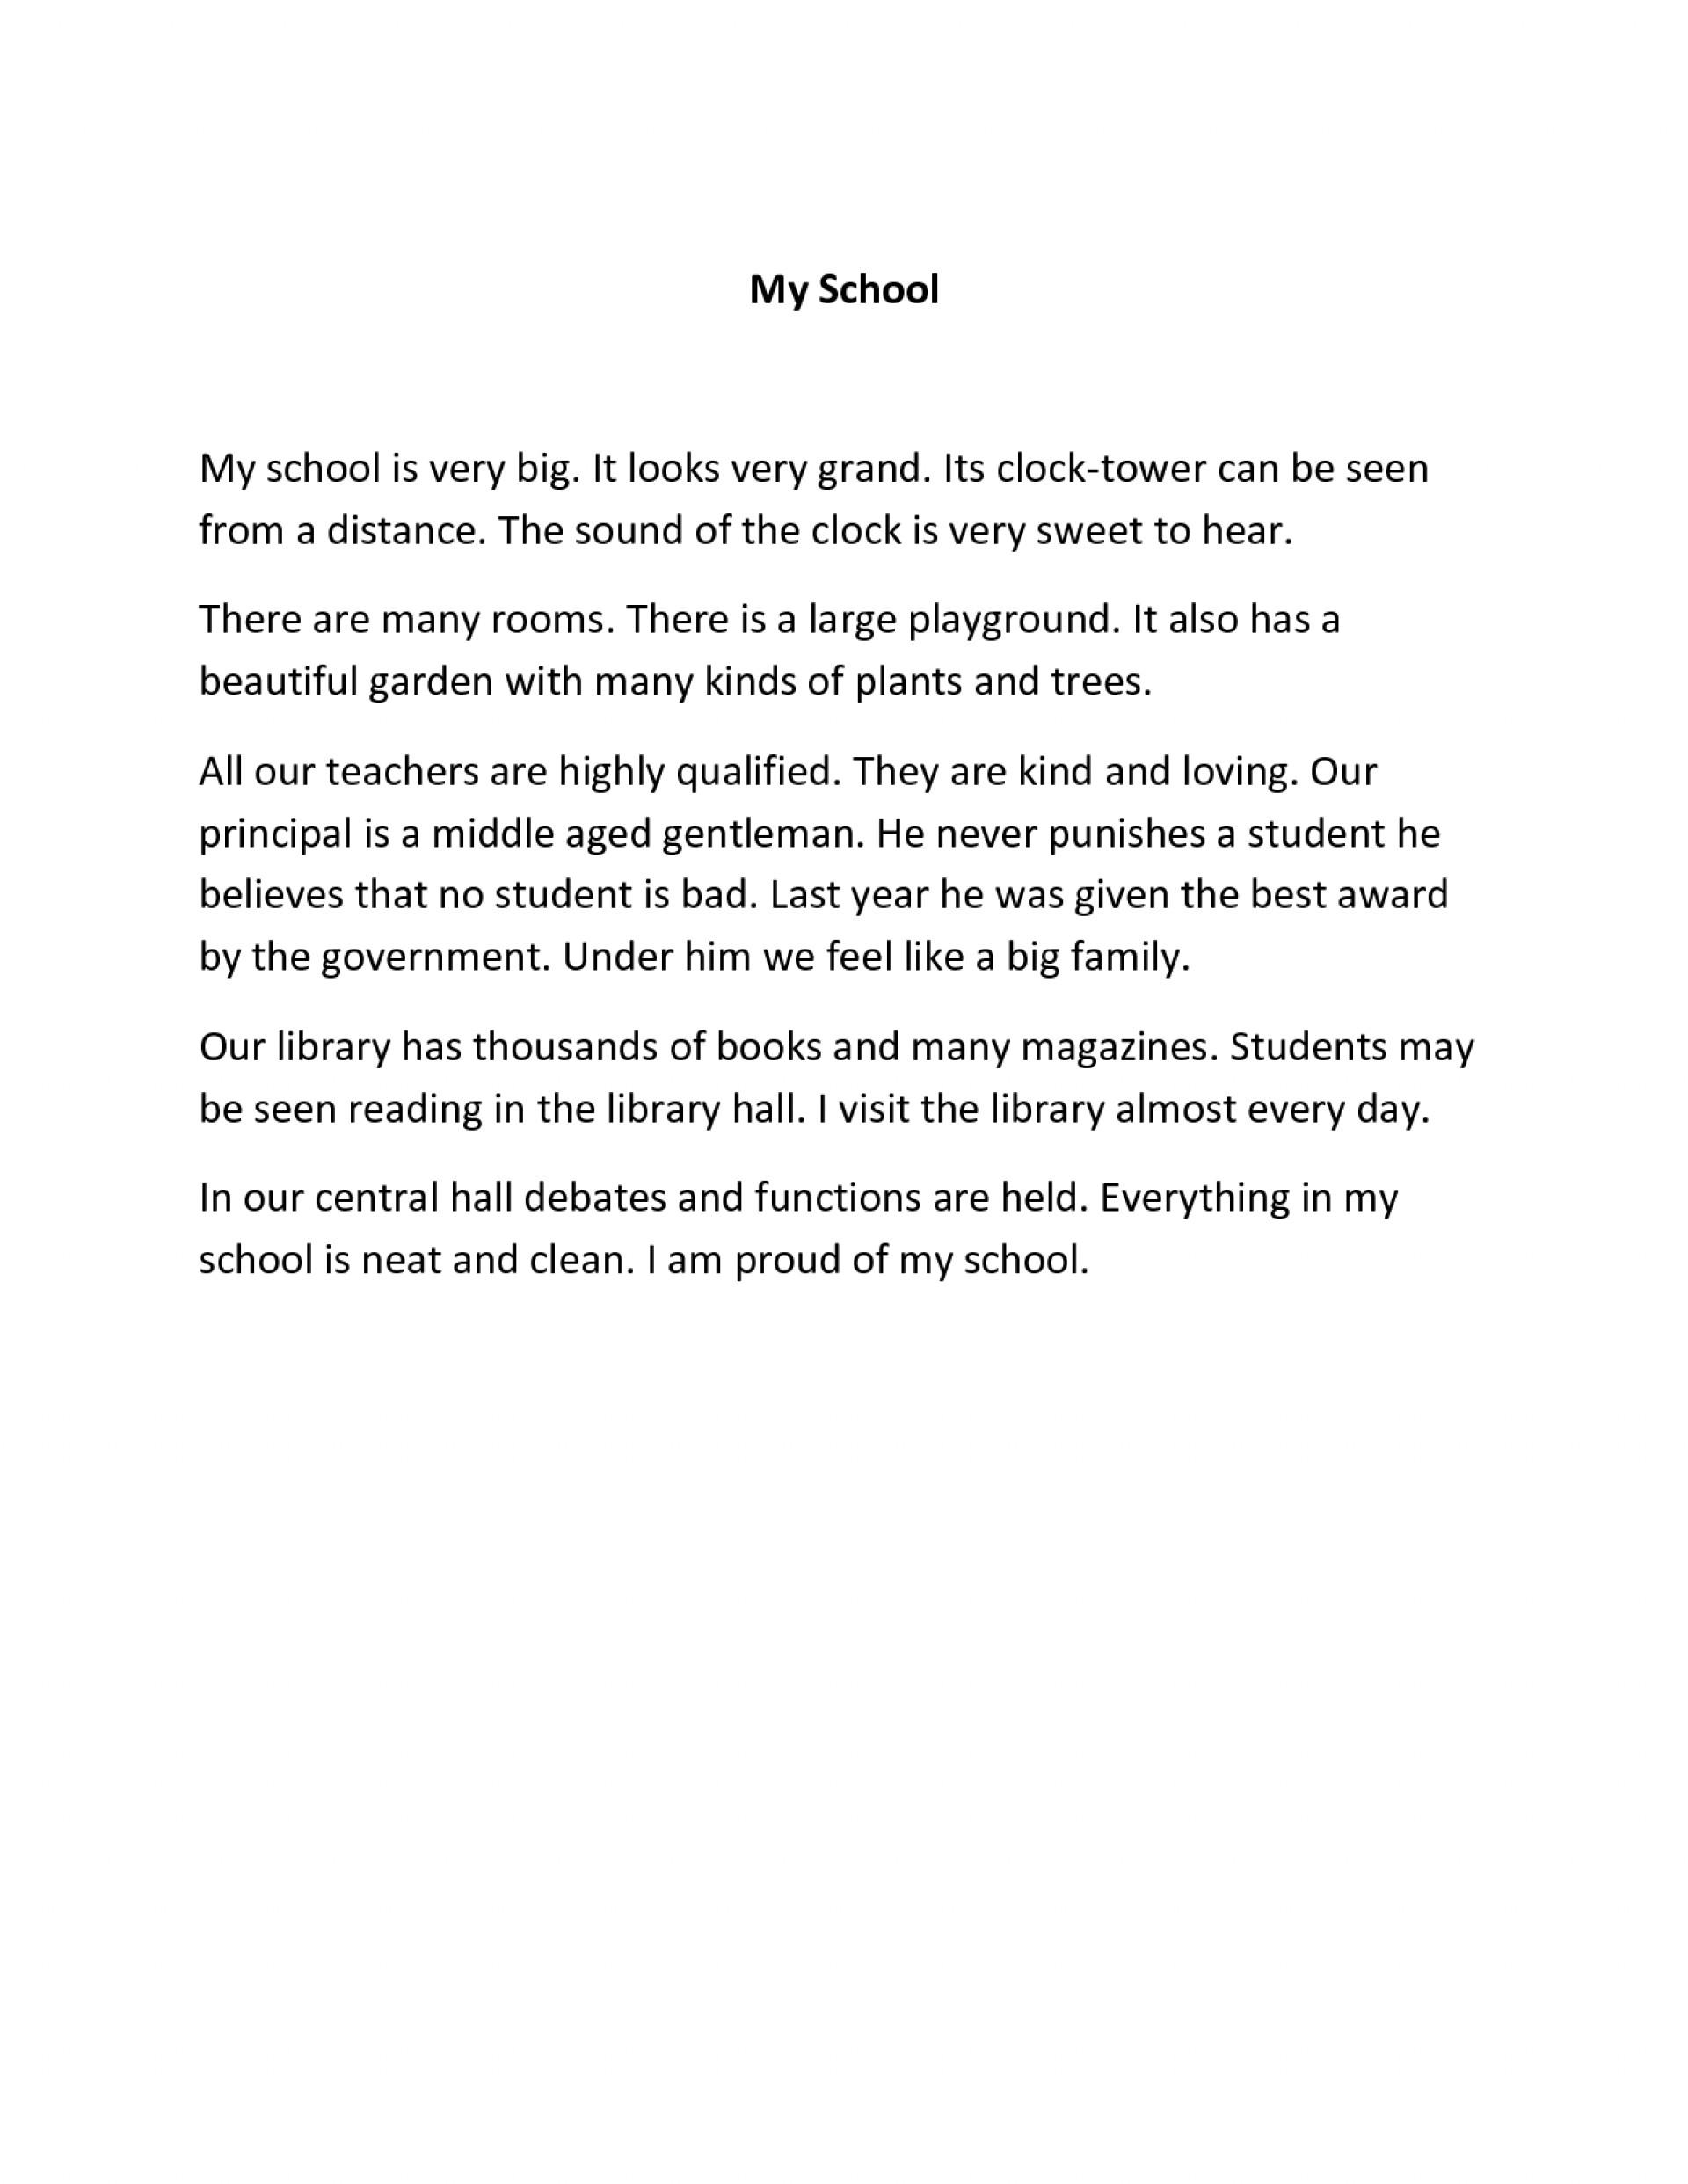 002 Essay Example My School Amazing Dream For Class 10 In Urdu 1 3 Marathi 1920